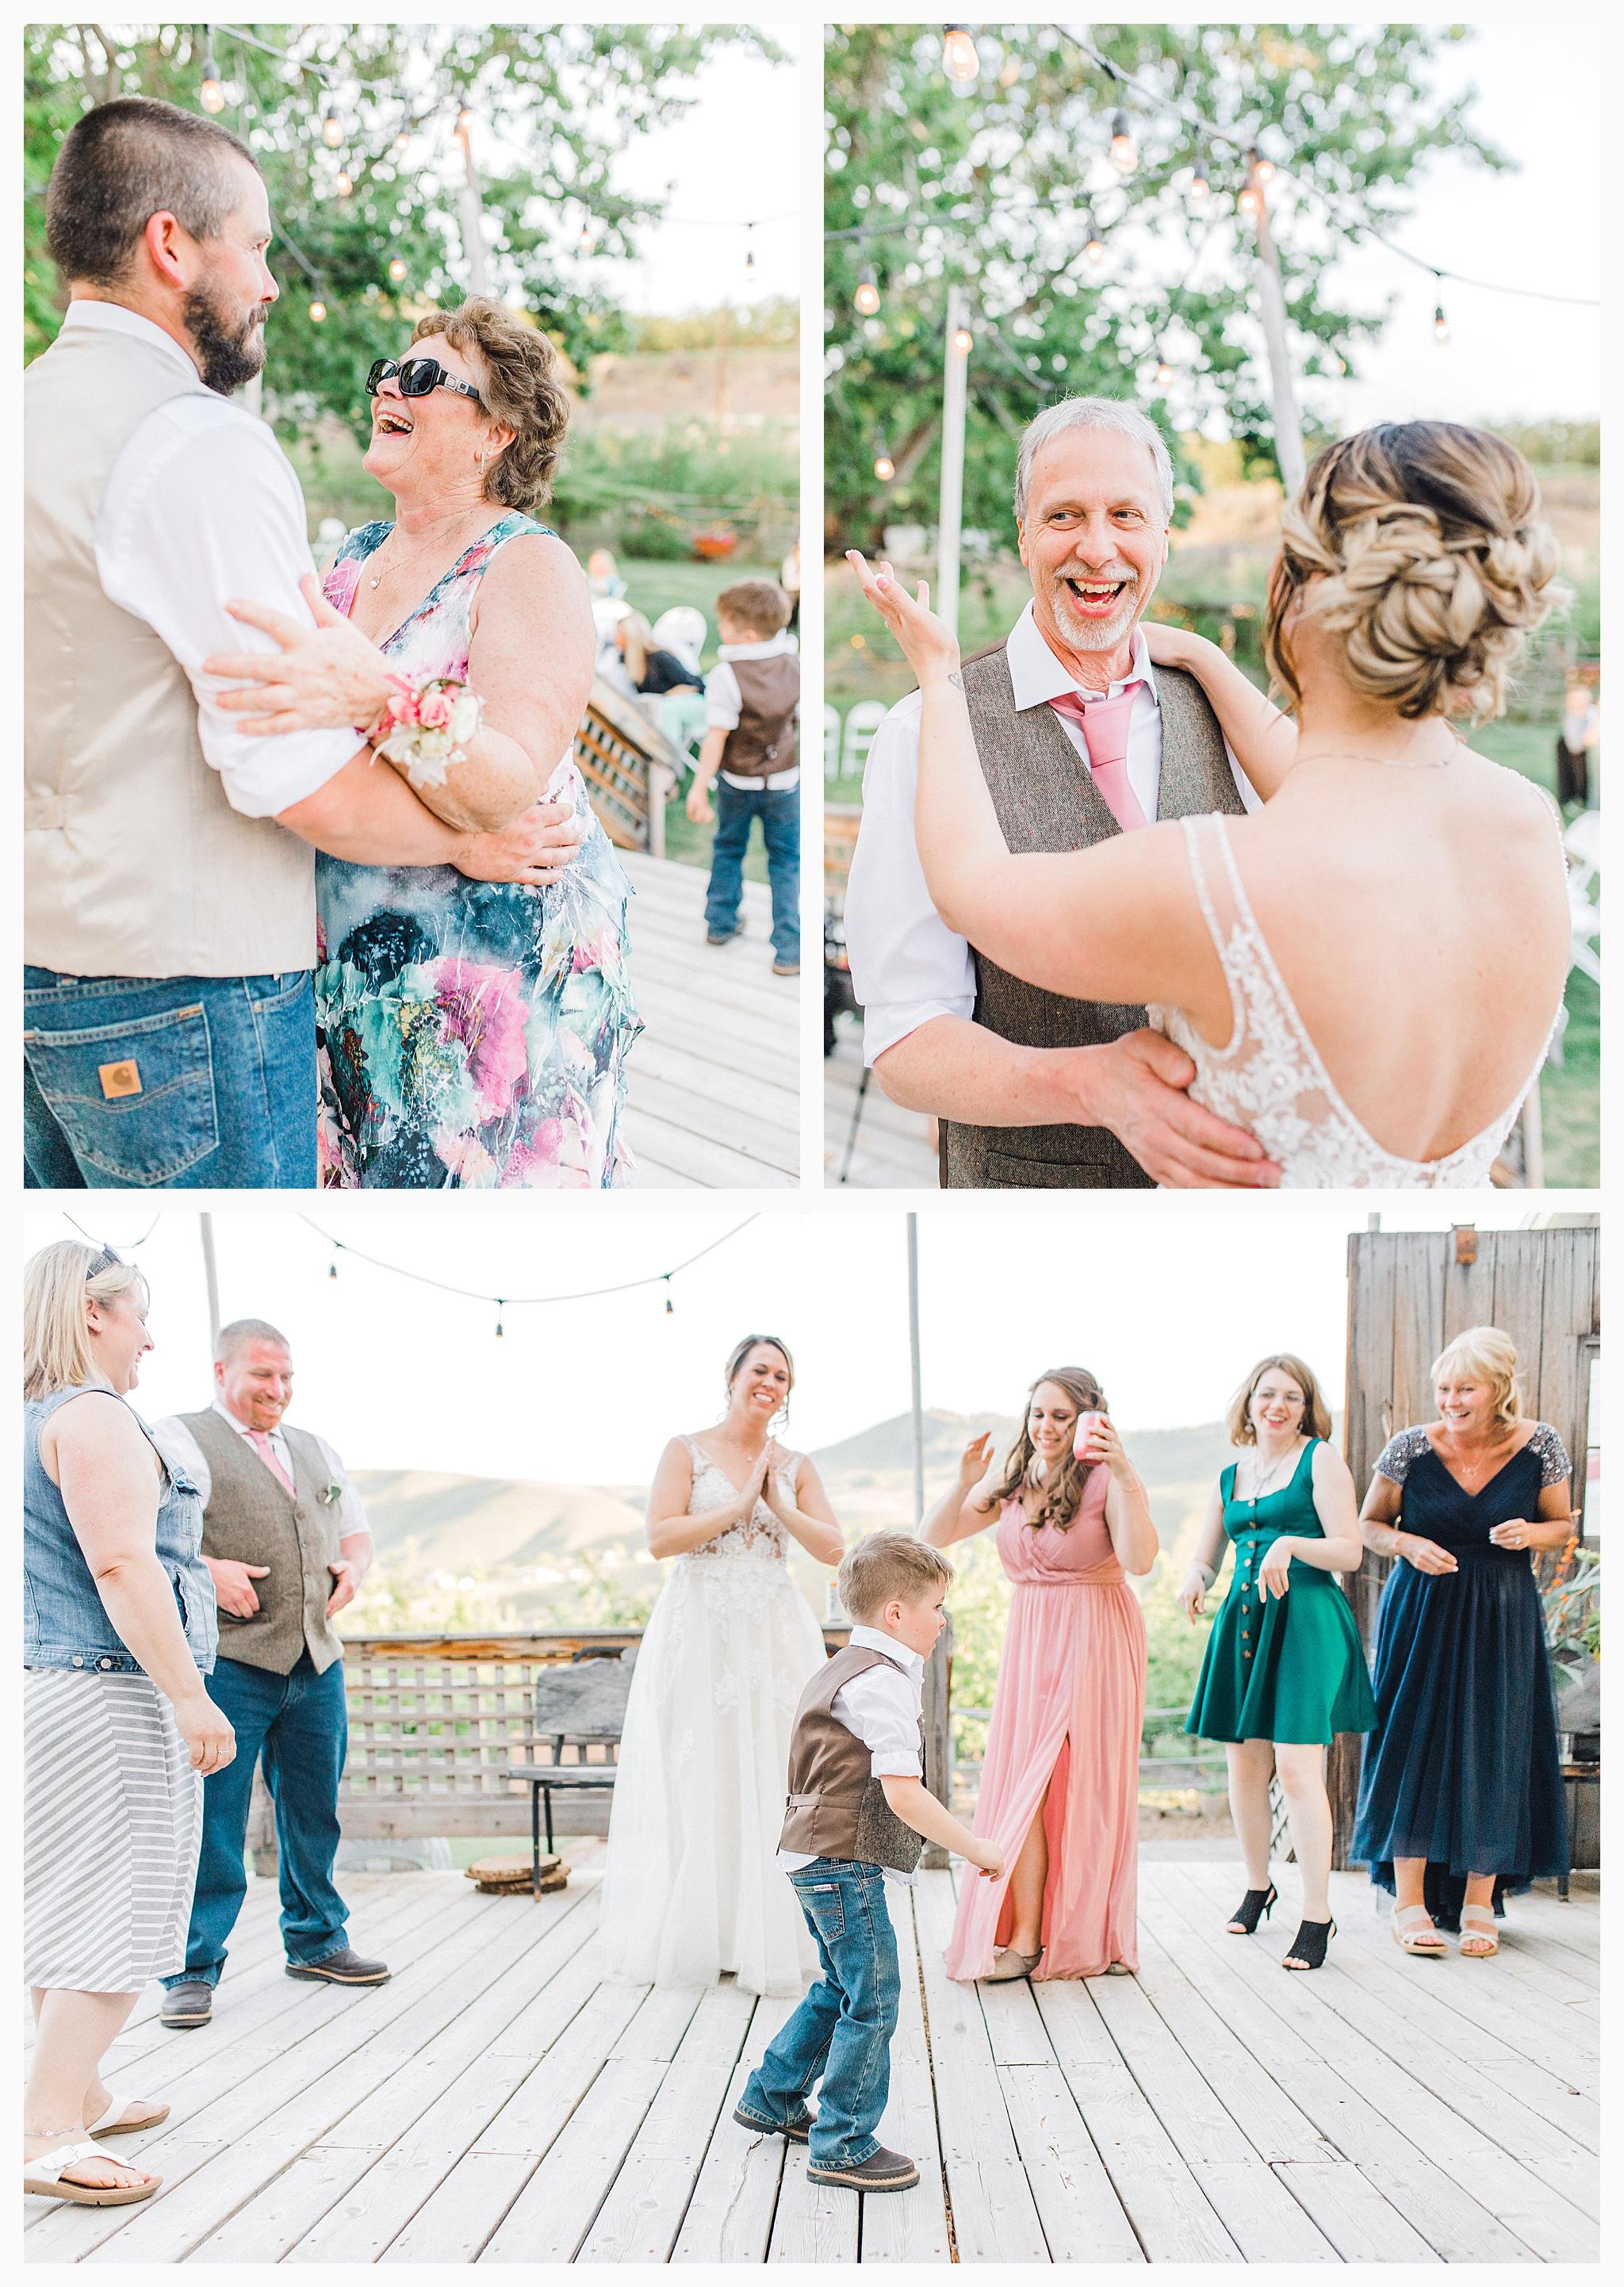 Rustic barn wedding in Wenatchee Washington at Sunshine Ranch on Easy Street, Emma Rose Company Seattle PNW Light and Airy Wedding Photographer_0111.jpg